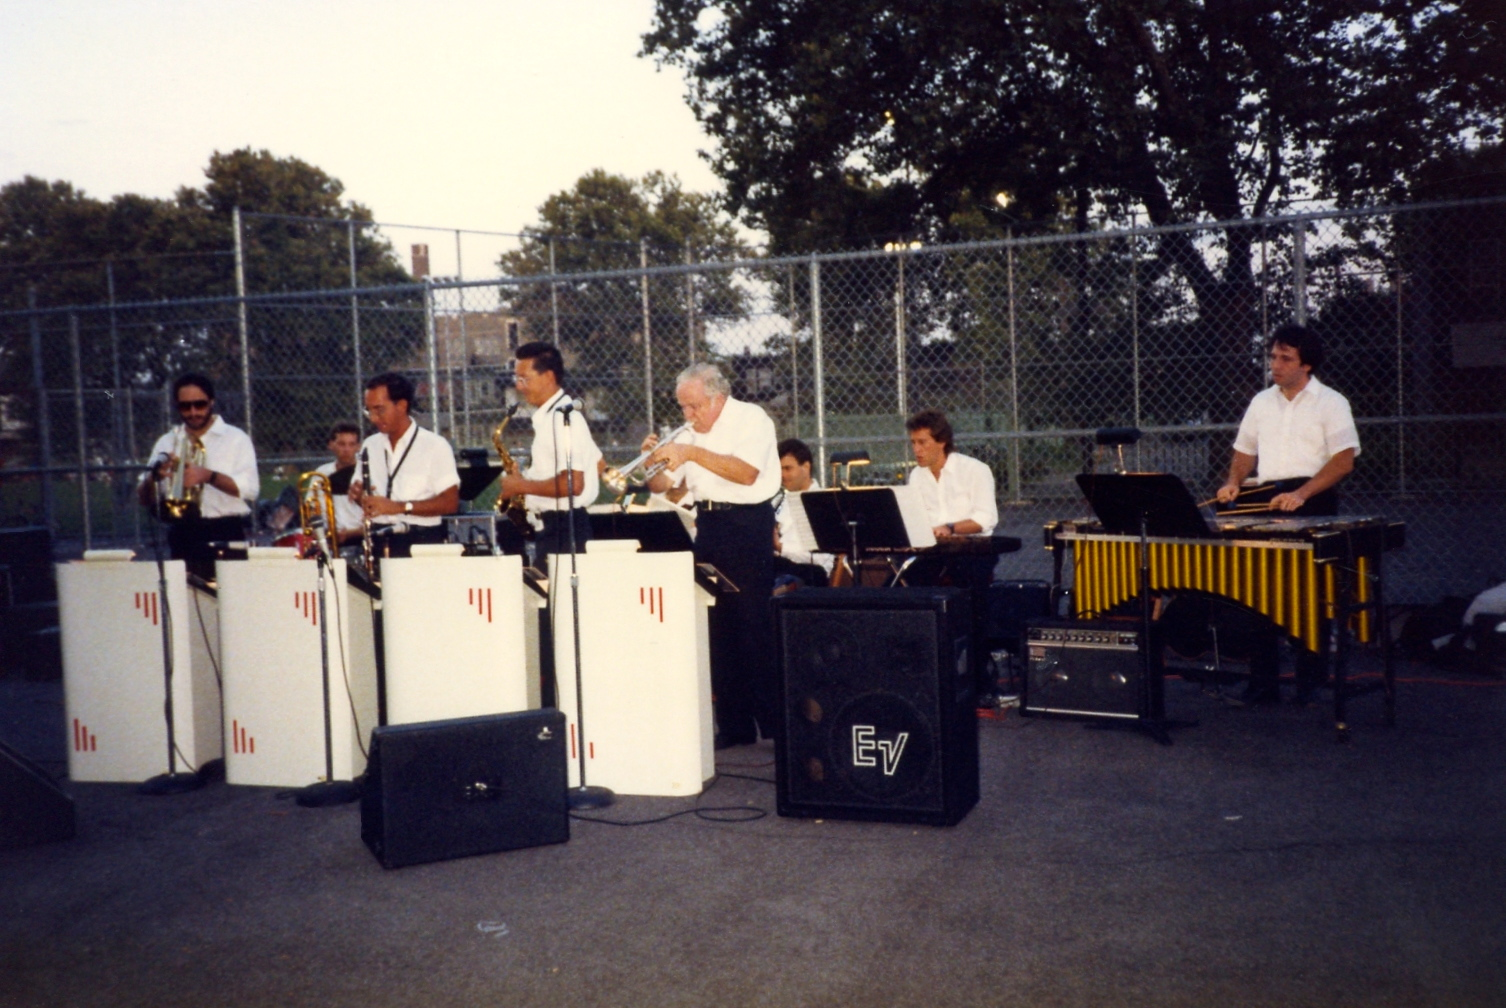 Cohocksink Park (1987)